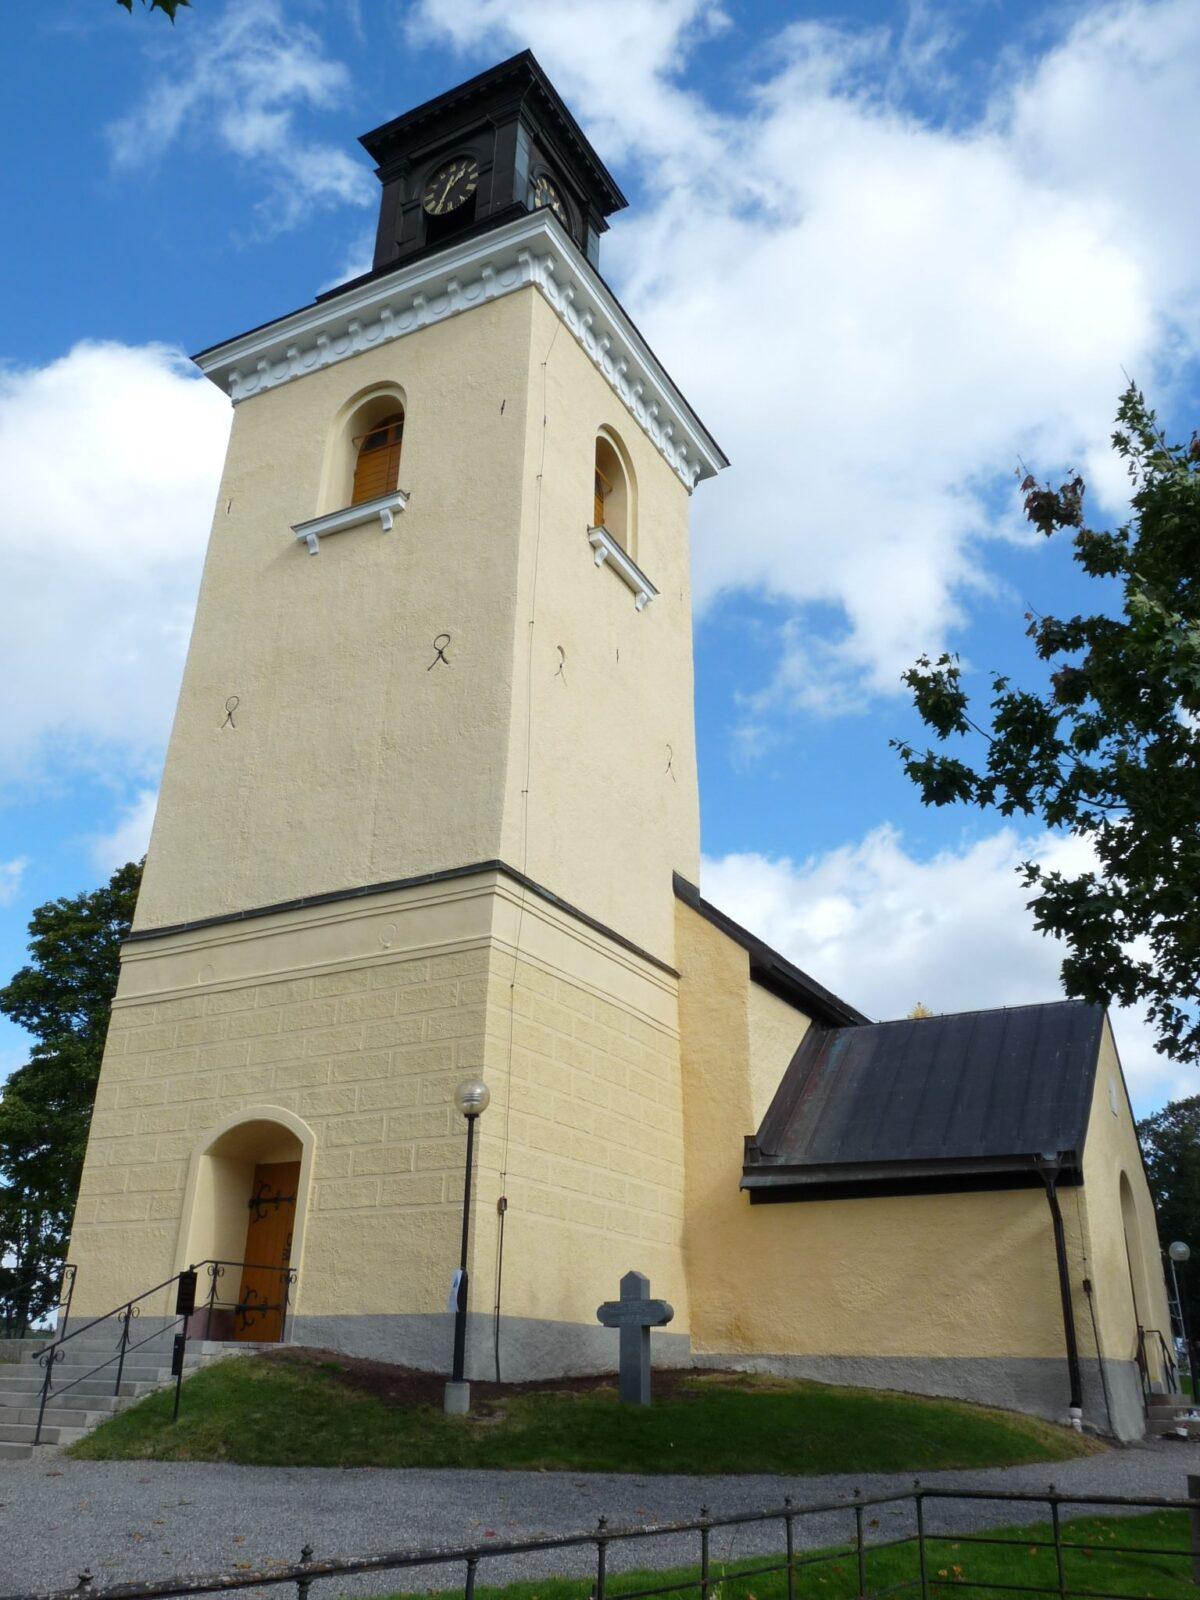 Turinge kyrka-P1030240-e1349803640179